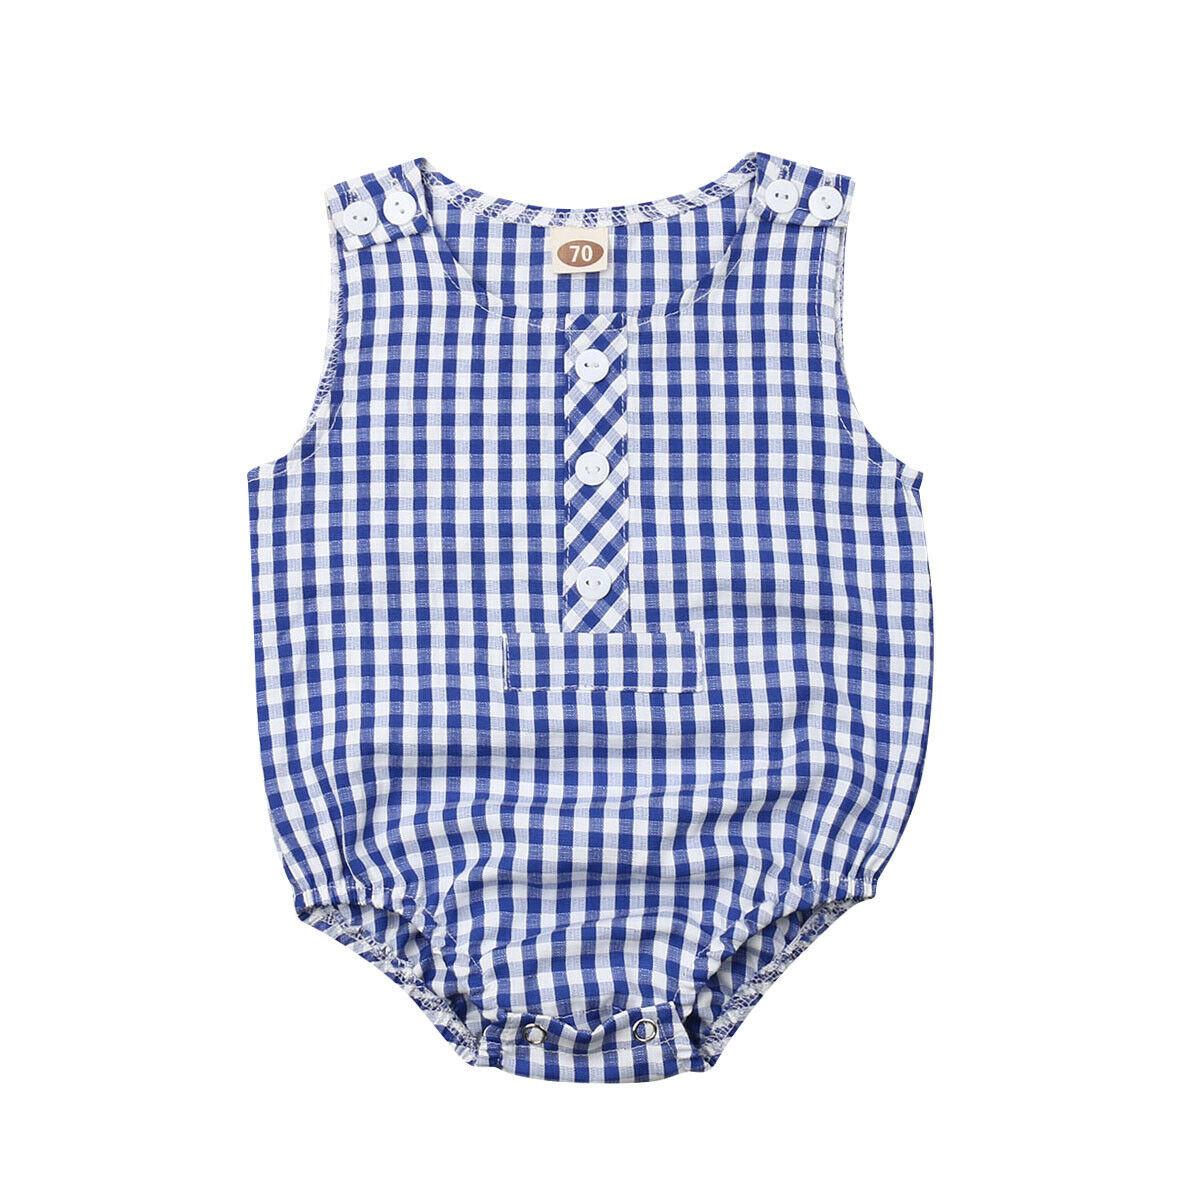 0-24 M Nieuwe Zomer Baby Meisje Jongen Plaid Bodysuits Mouwloze Blauwe Jumpsuit Zomer Outfits Set